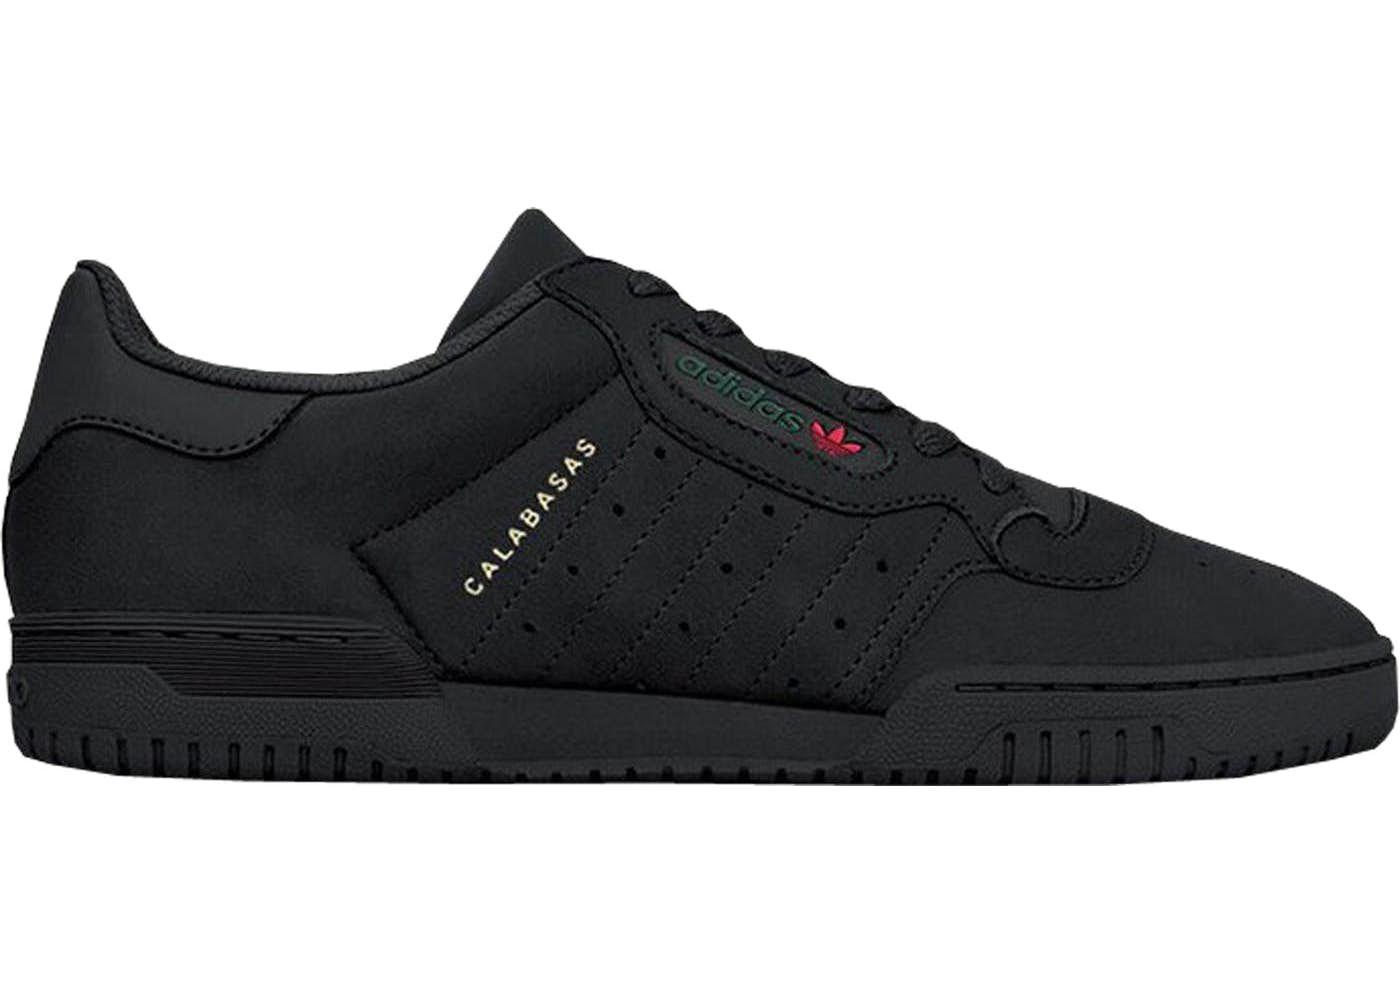 adidas calabasas shoes black